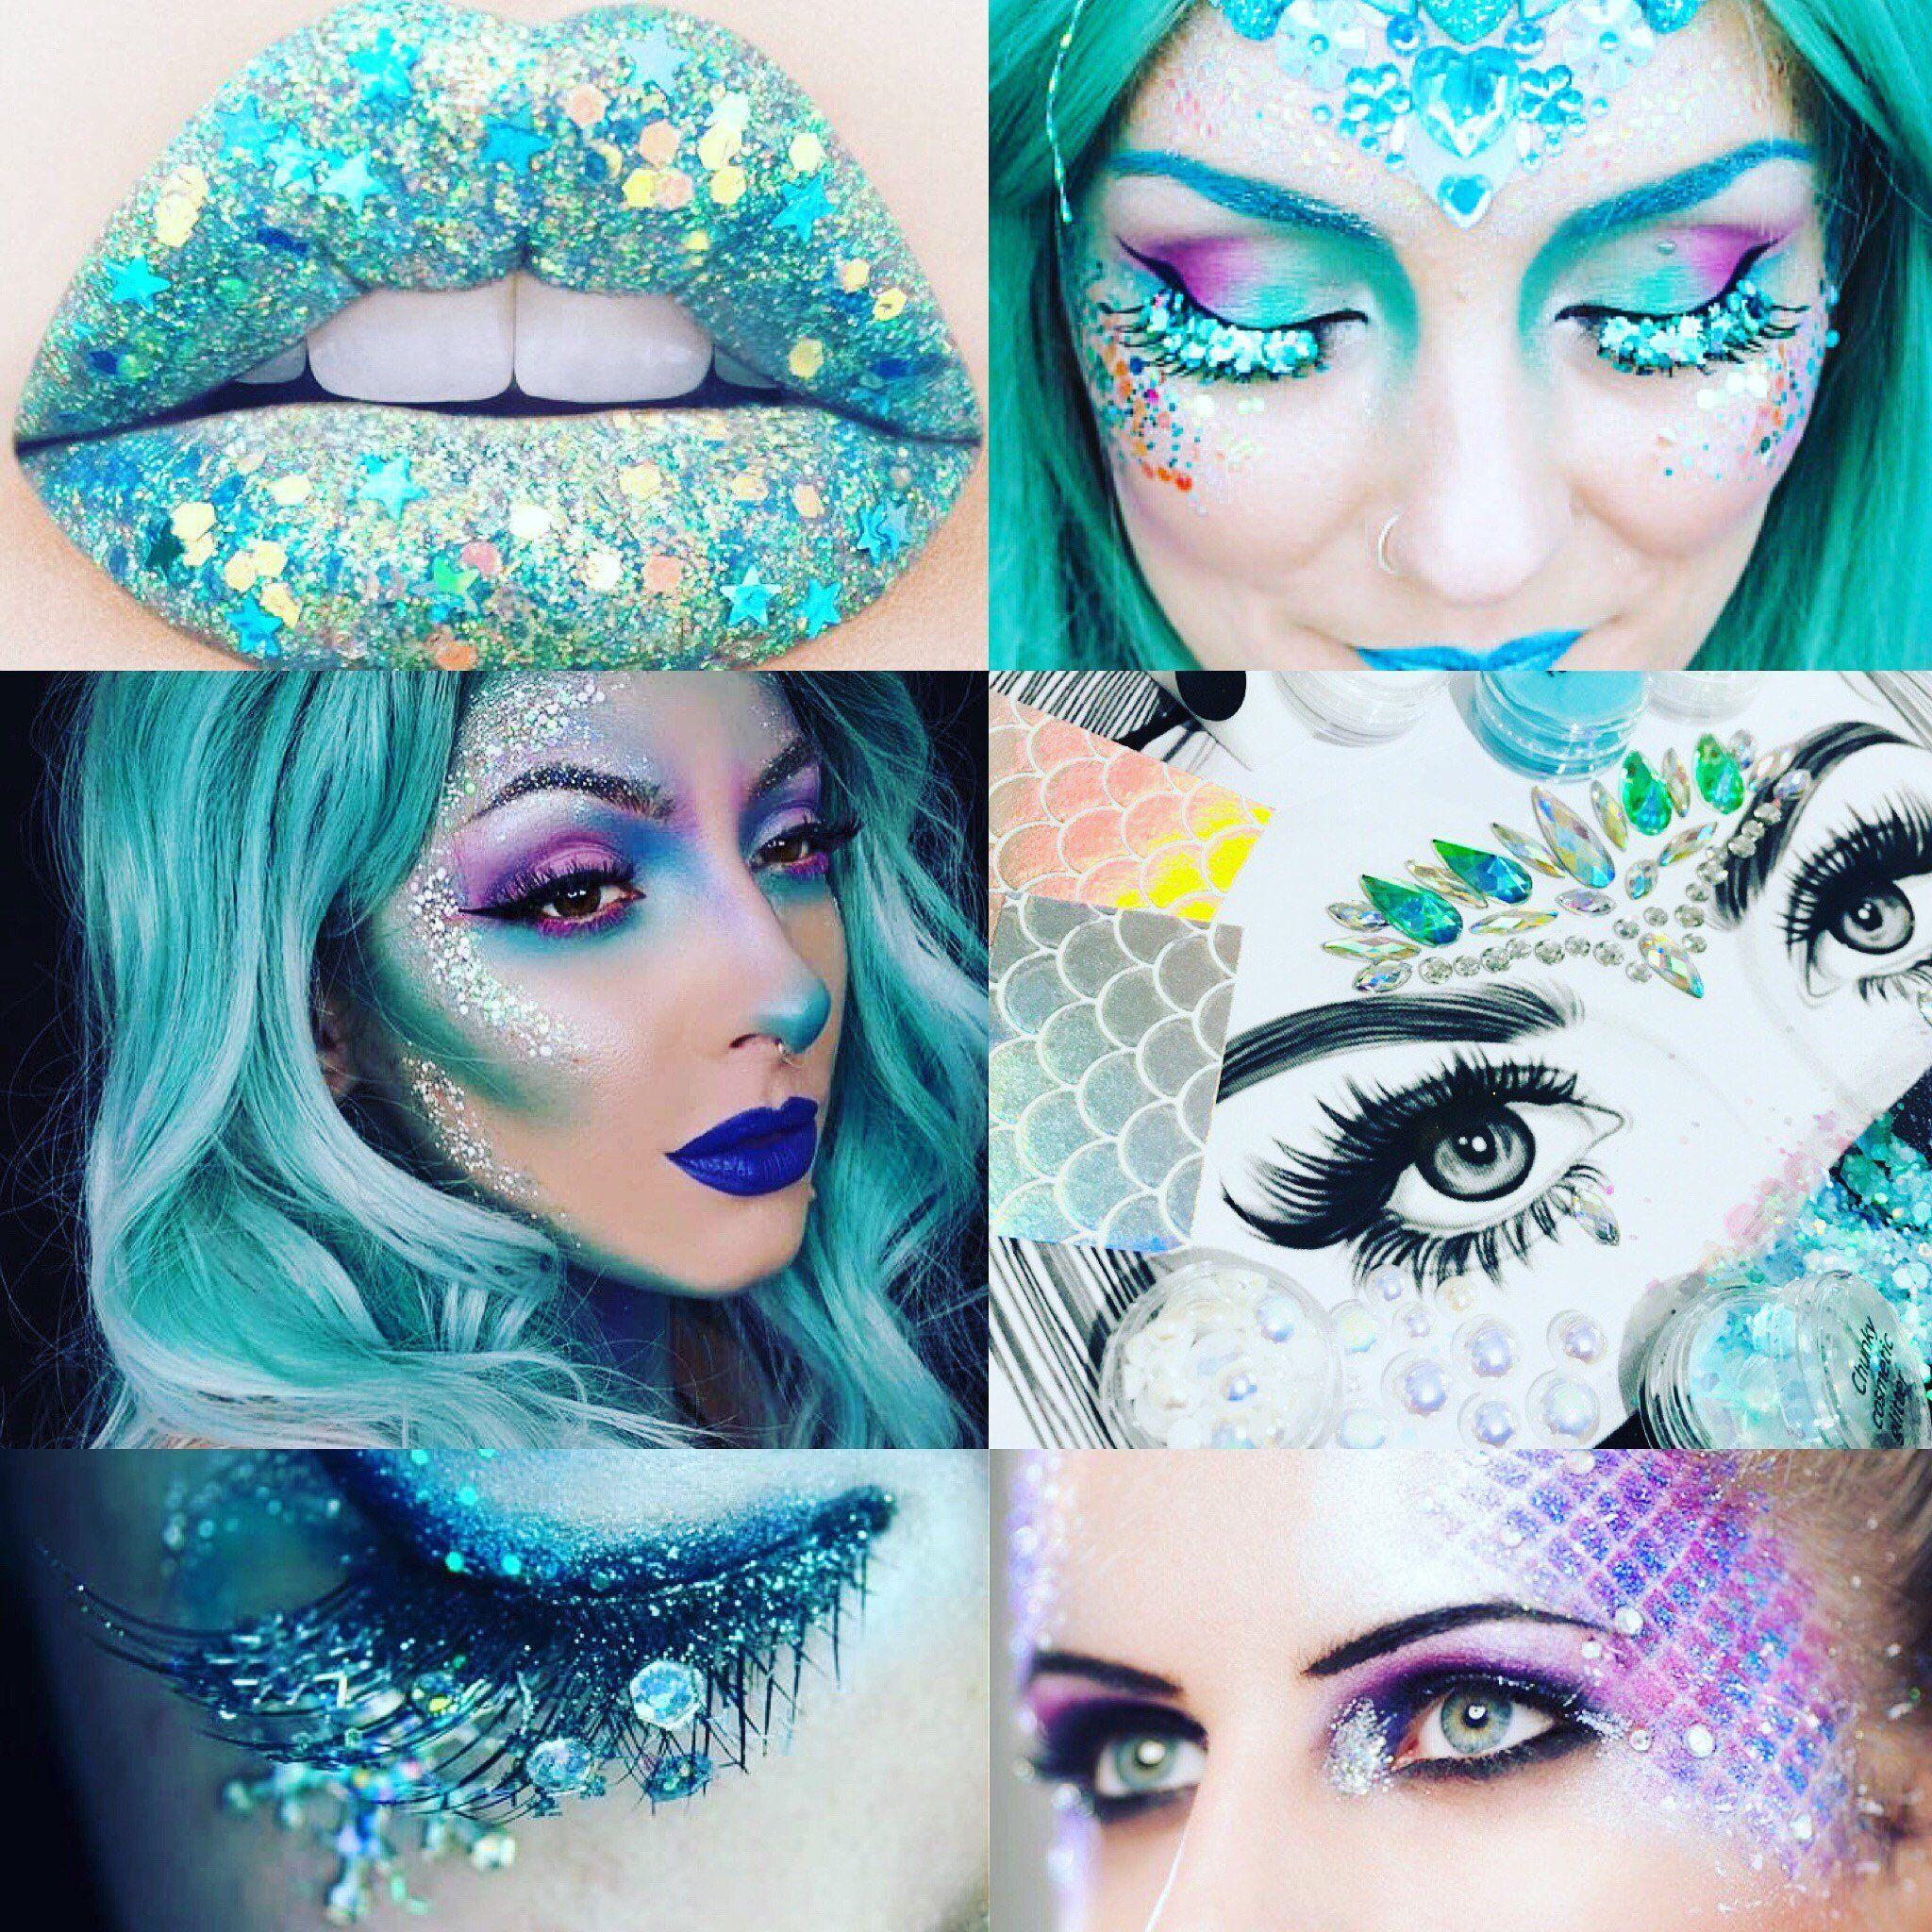 Mermaid Costume Halloween Kit Complete Crystal Makeup Set Includes